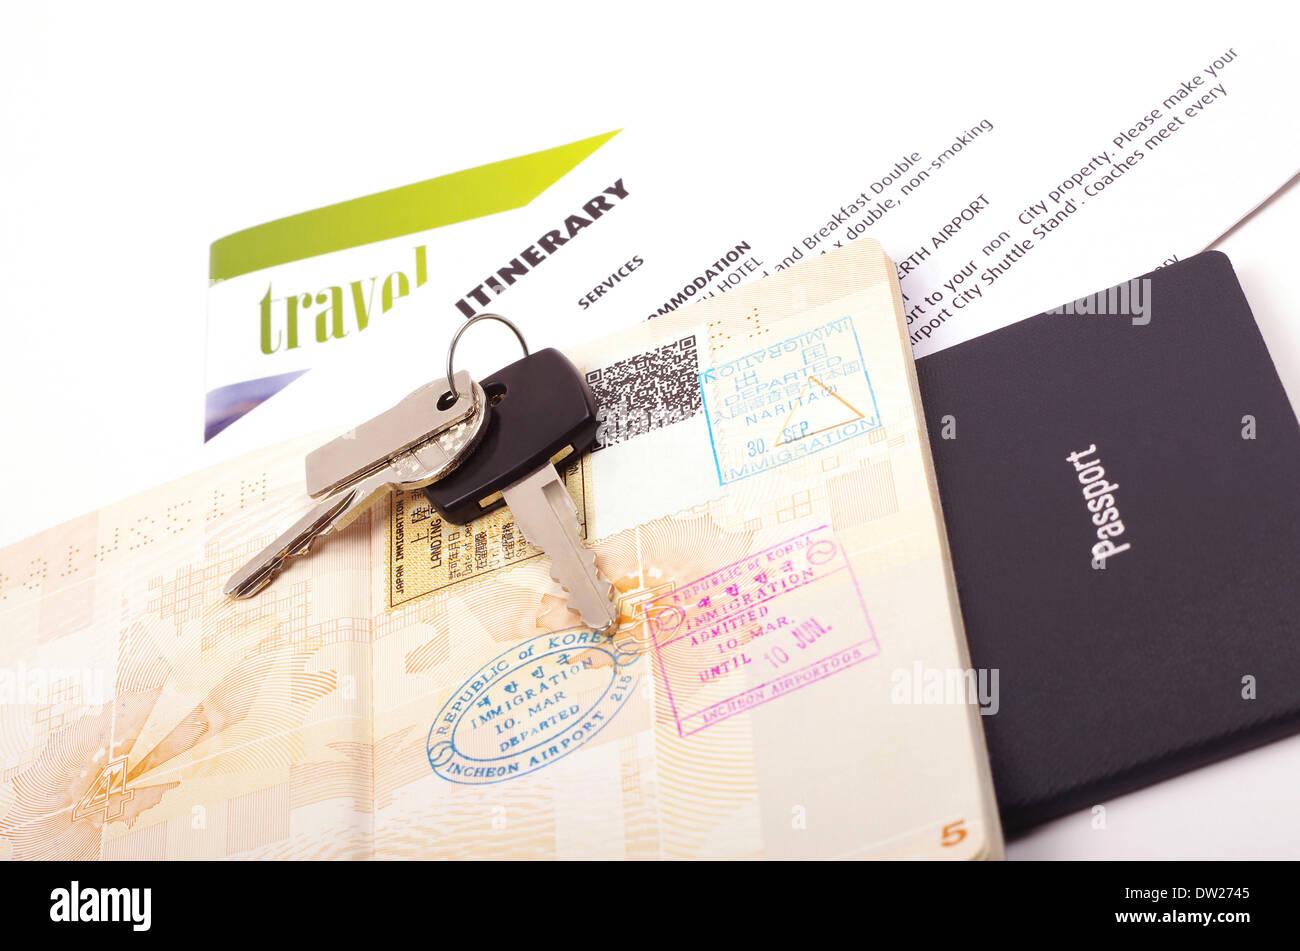 holiday travel documents - Stock Image